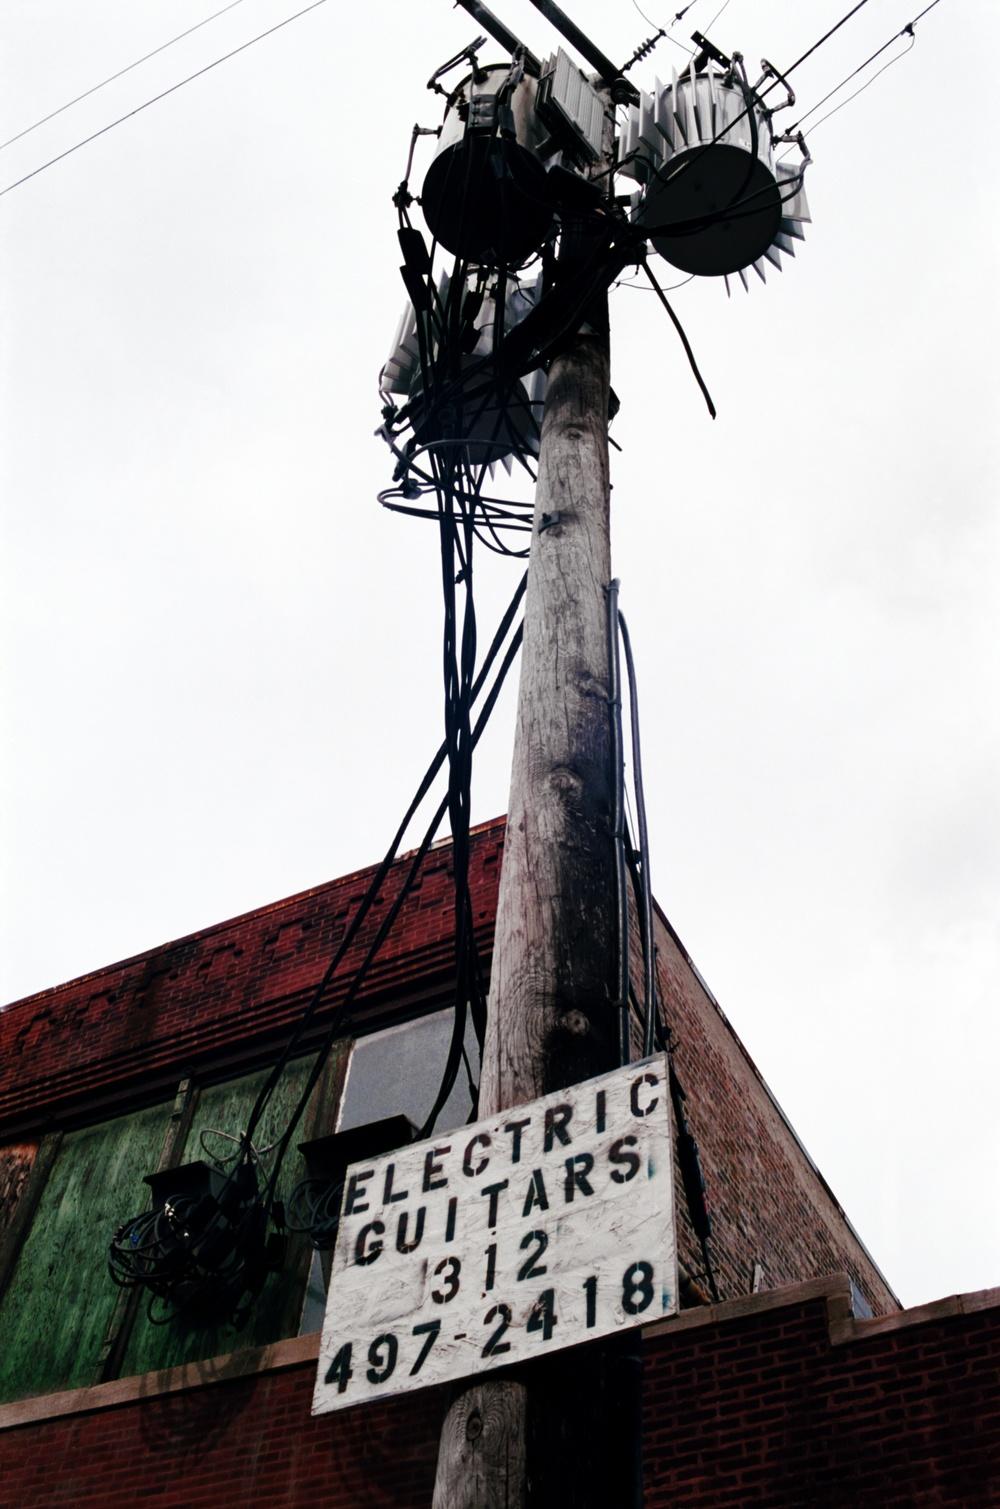 electricguitar copy.jpg